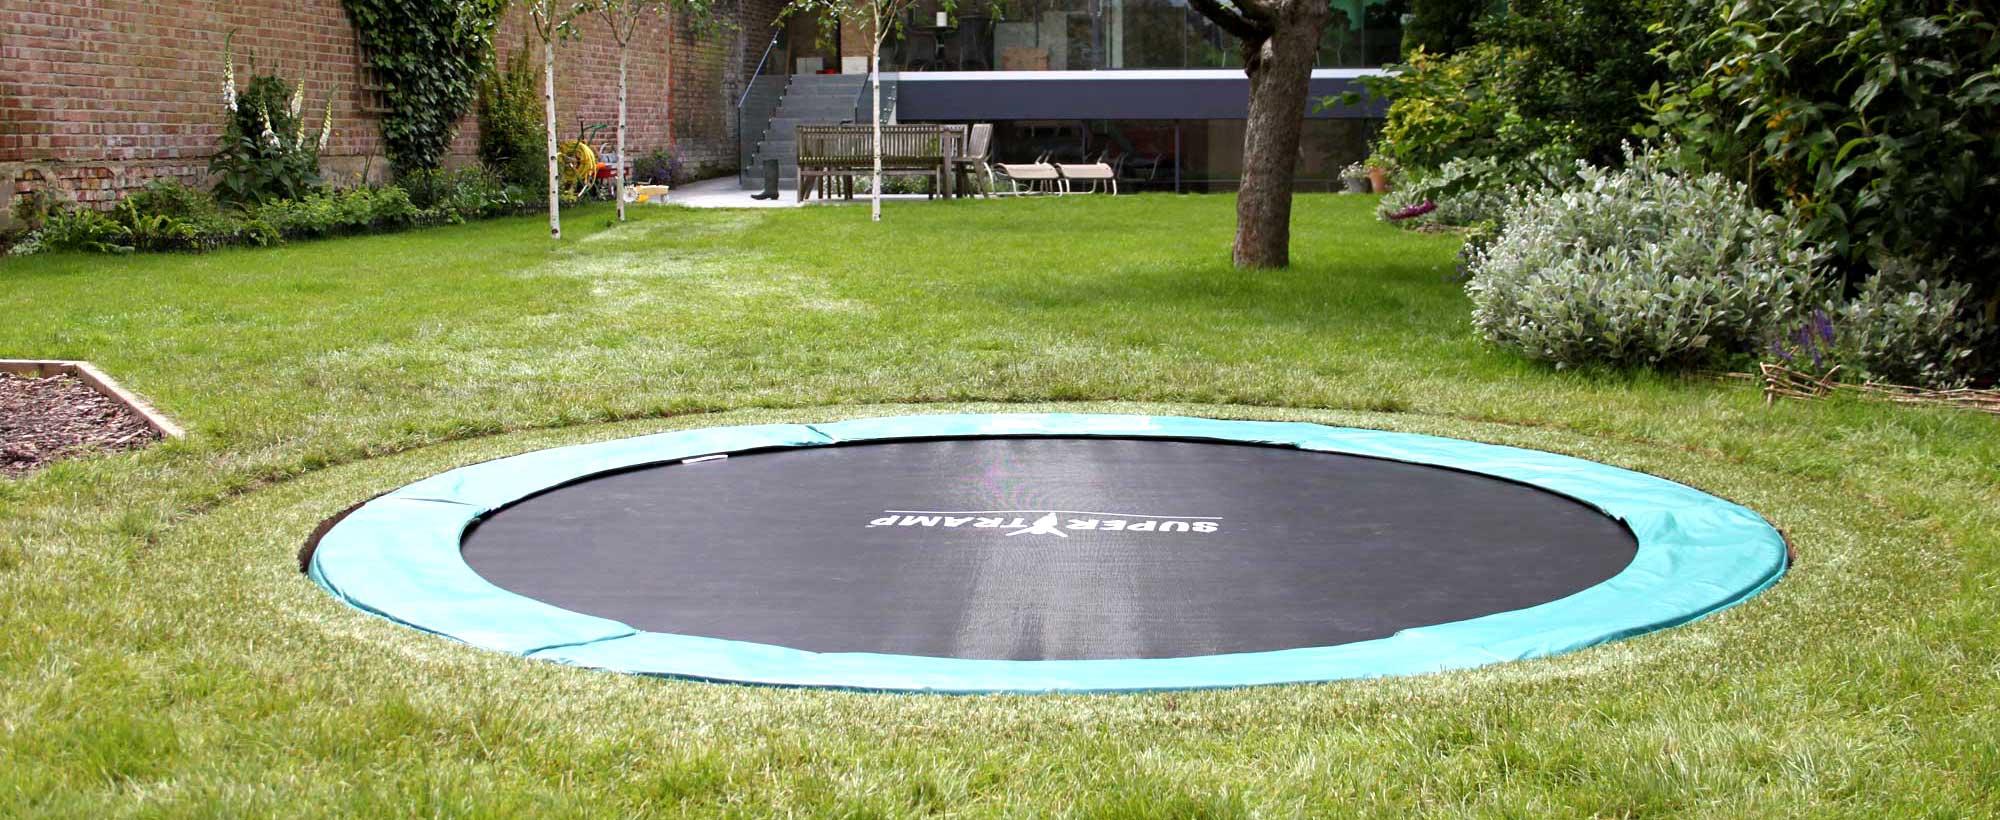 sunken-trampolines-residential